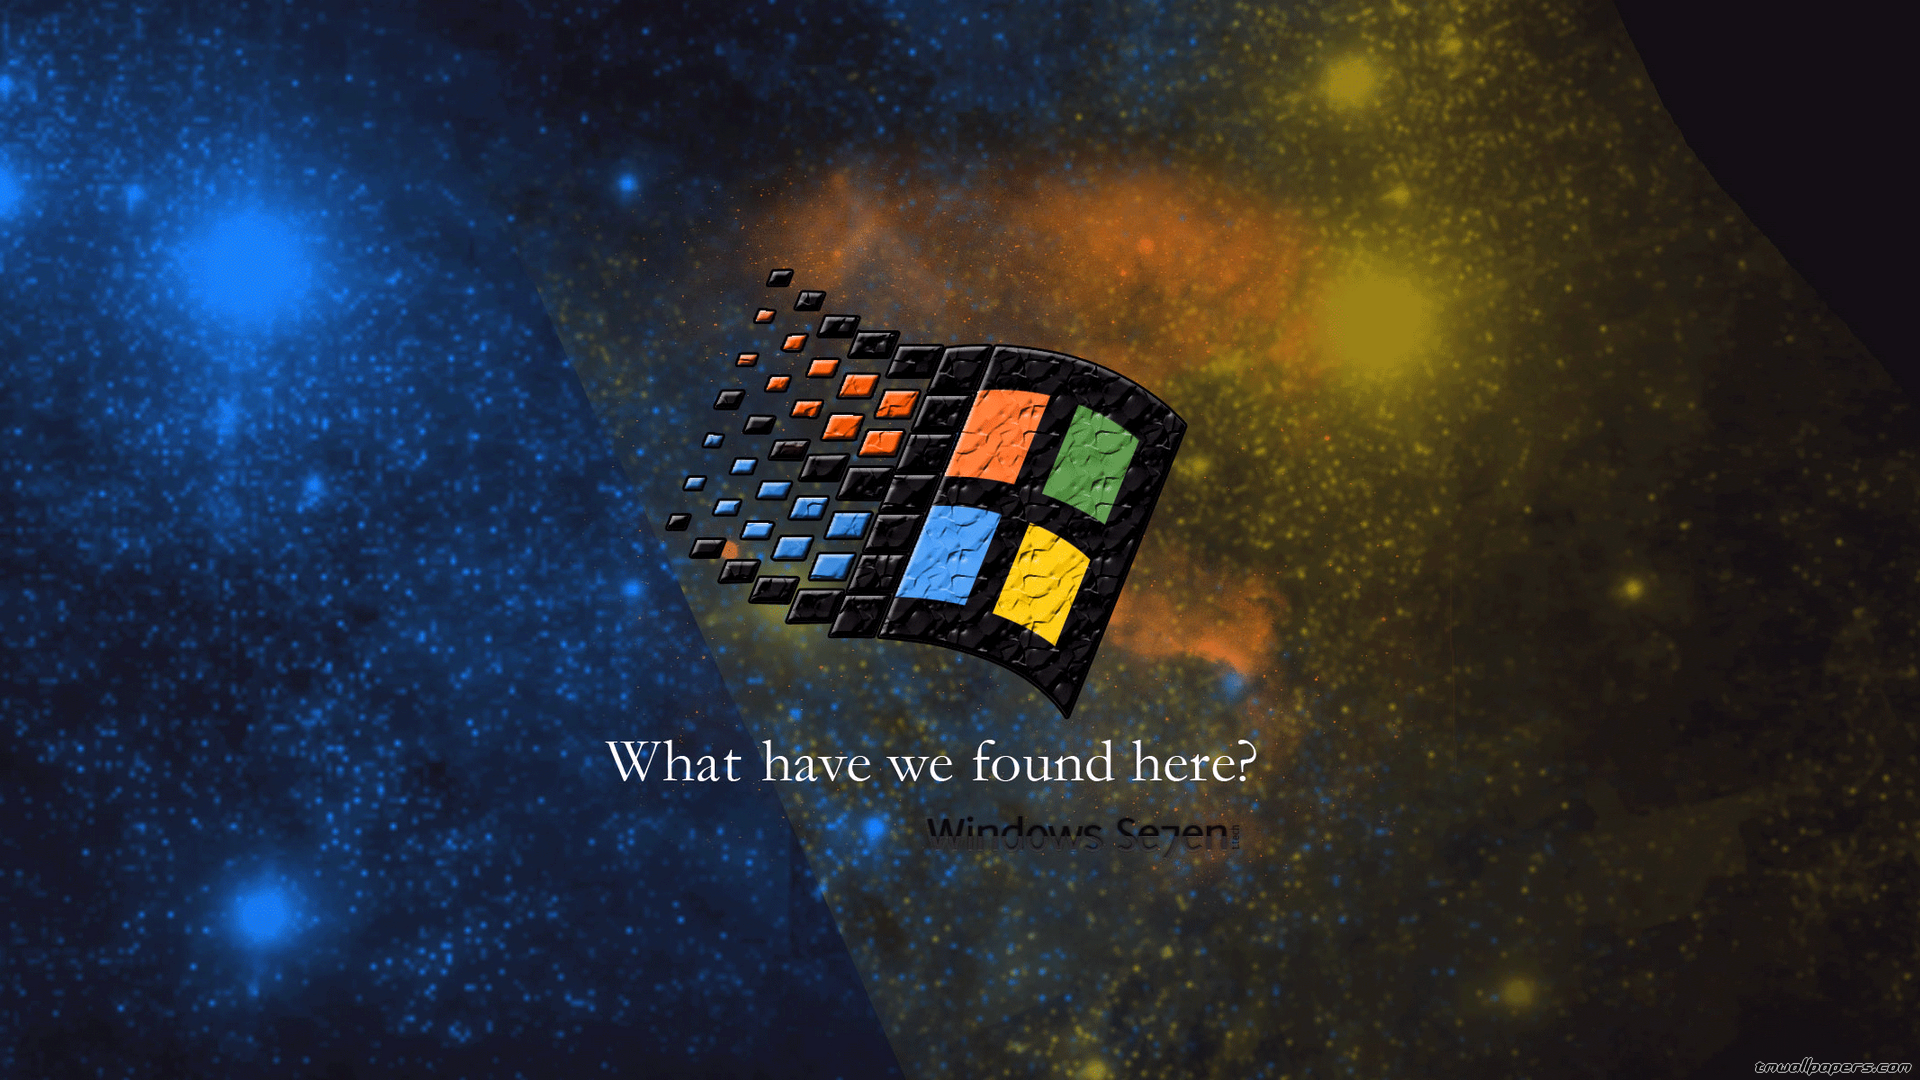 Windows 7 Wallpaper 1600X900 wallpaper   874245 1920x1080